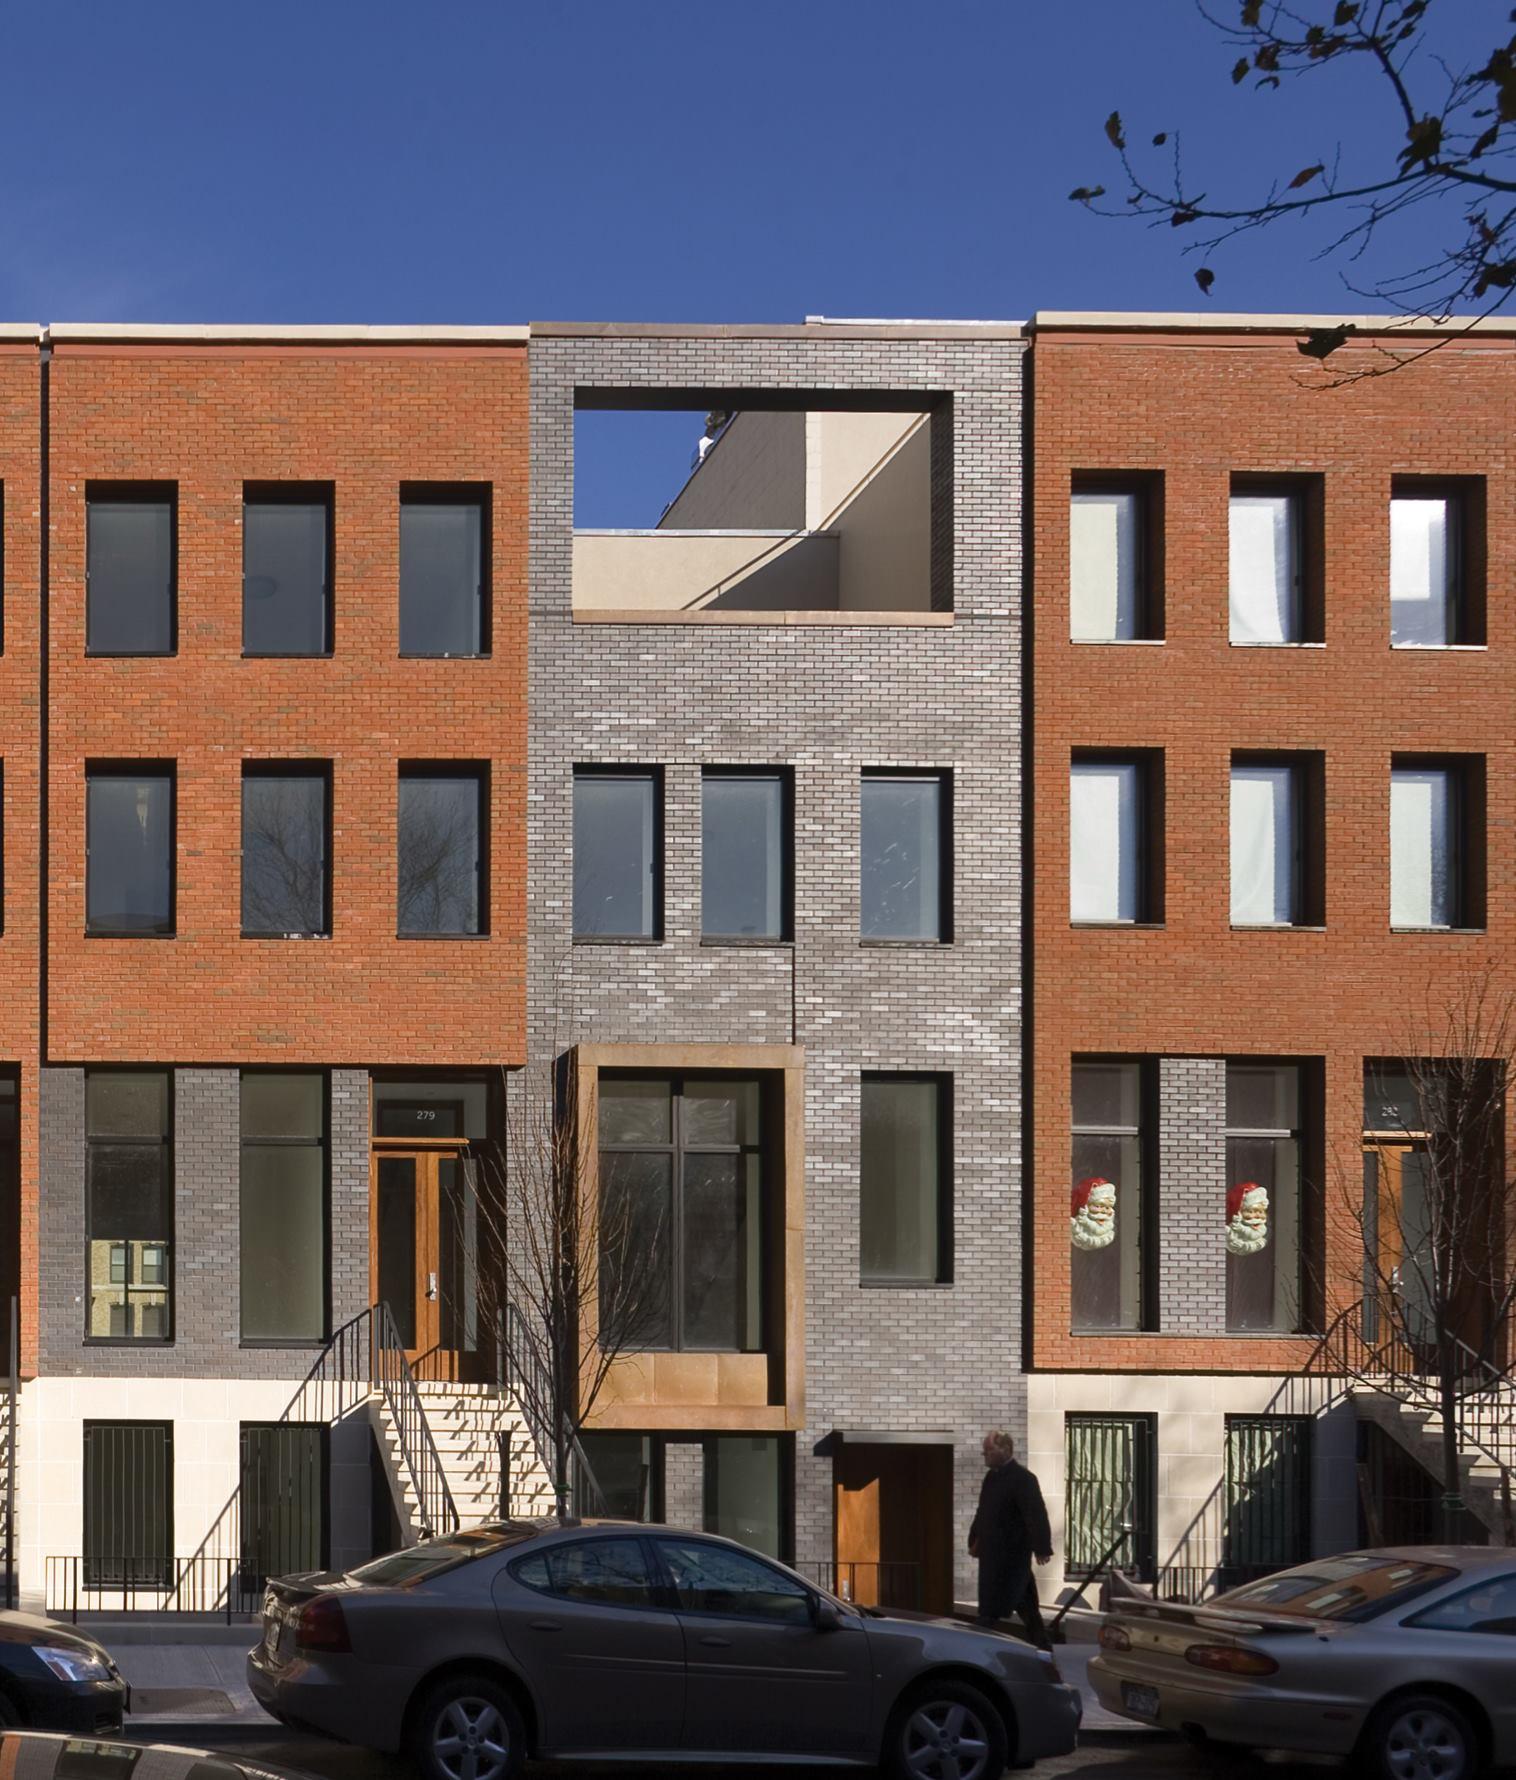 Find Townhomes: 14 Townhouses, Brooklyn, N.y.